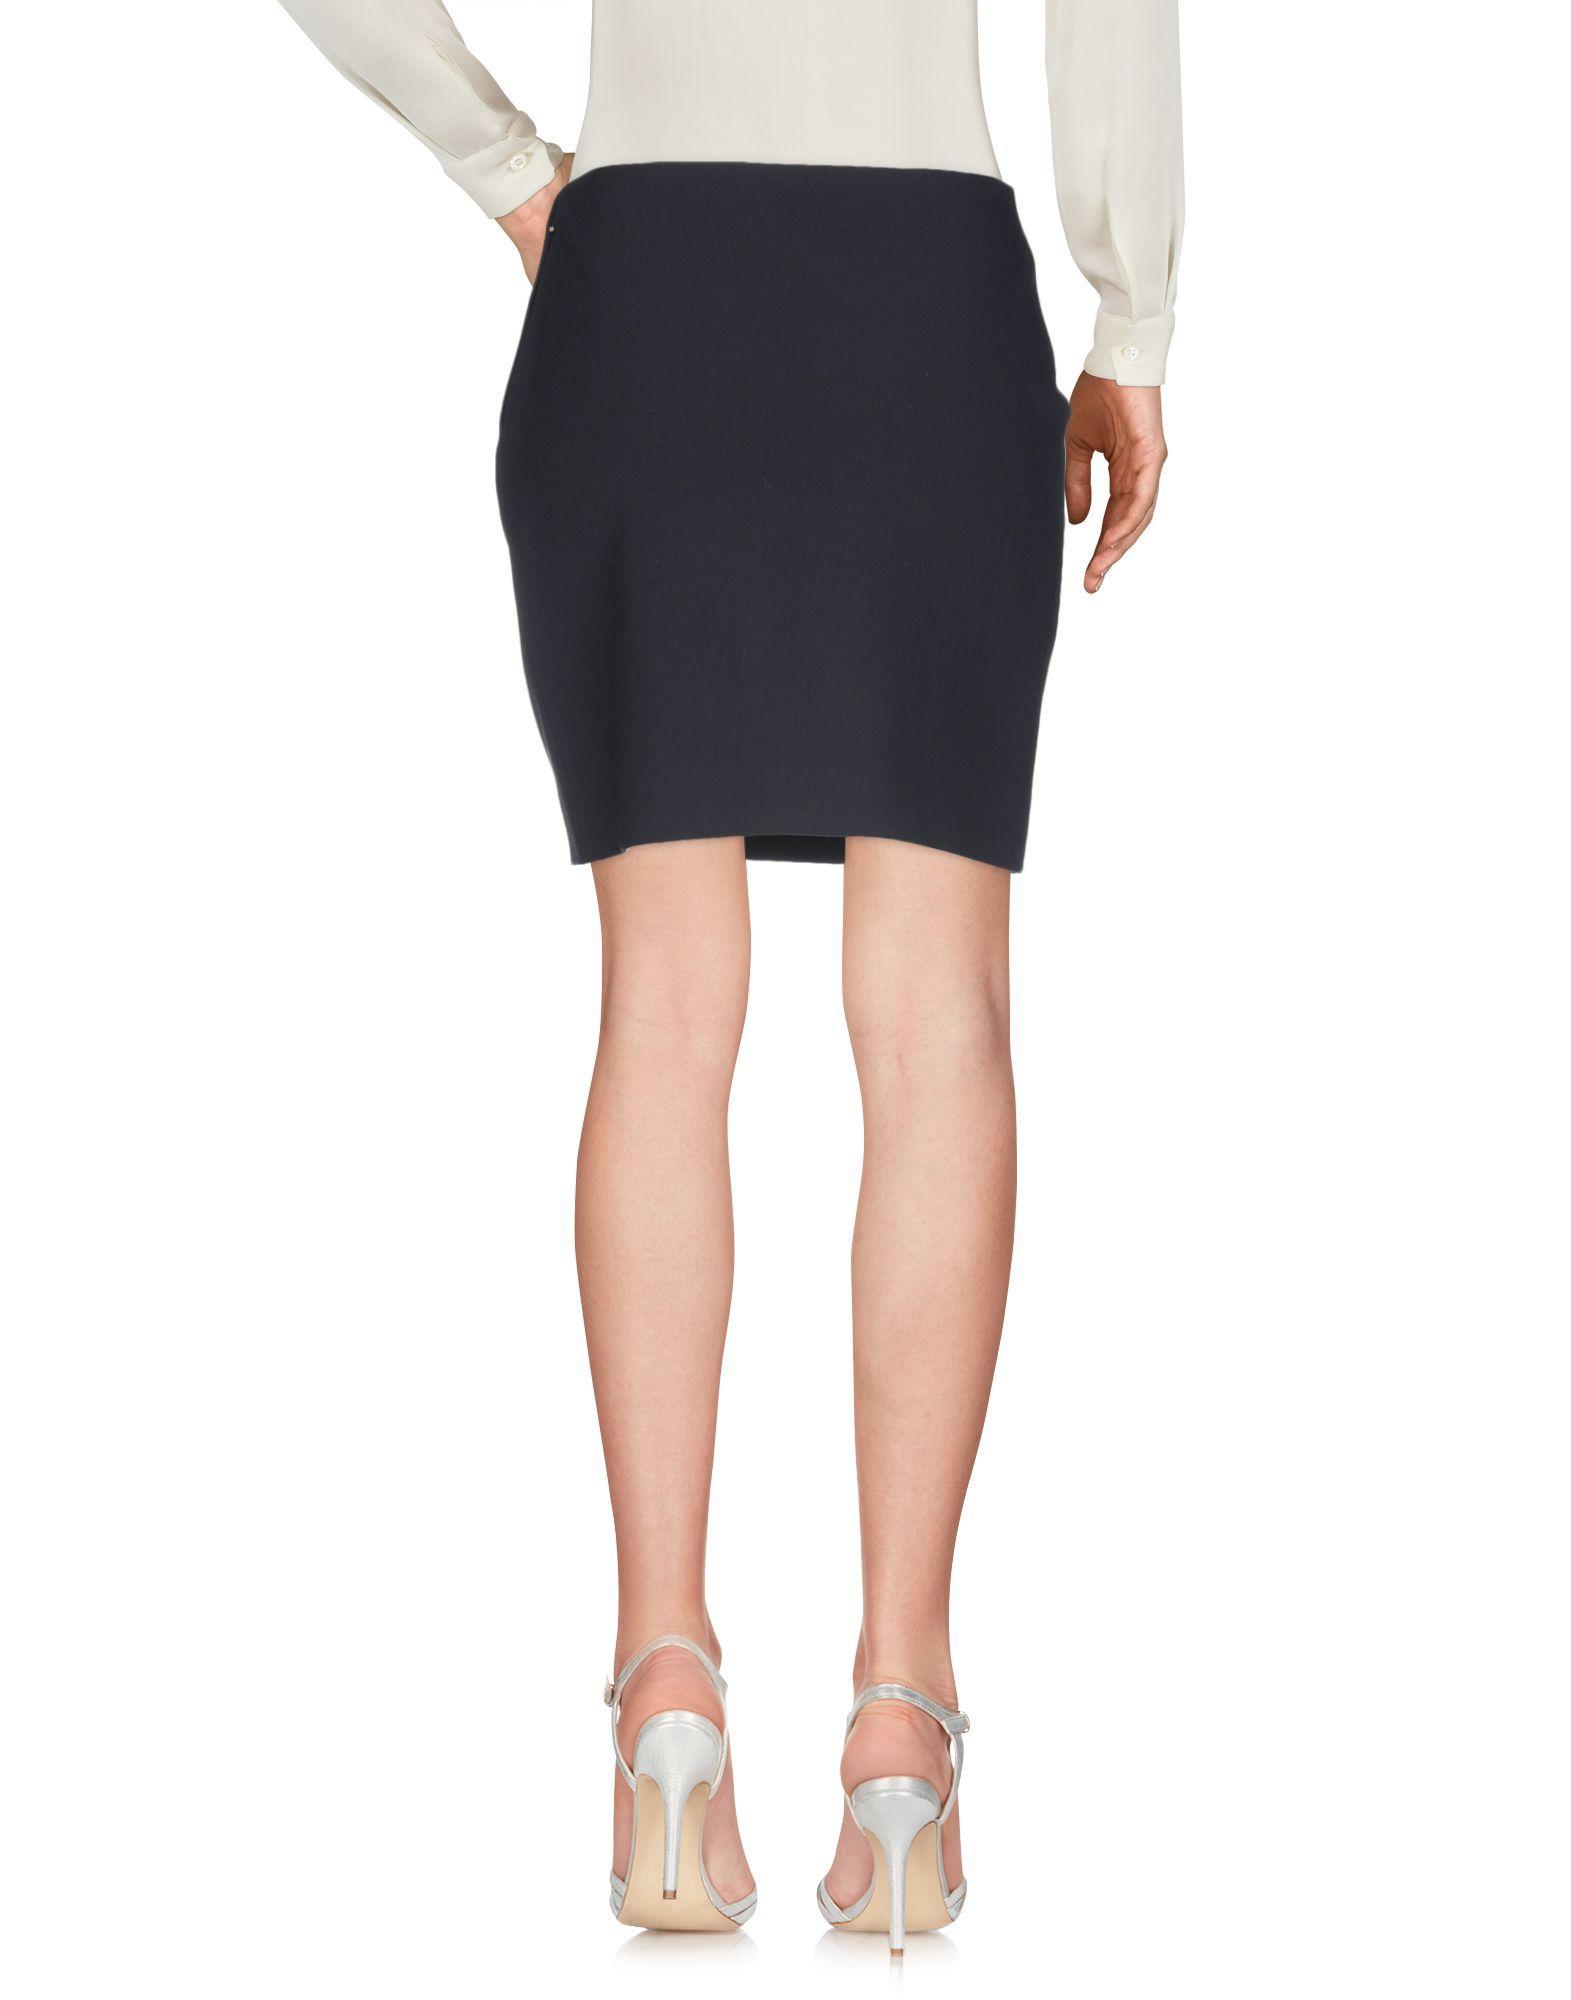 Lanvin Black Wool Skirt